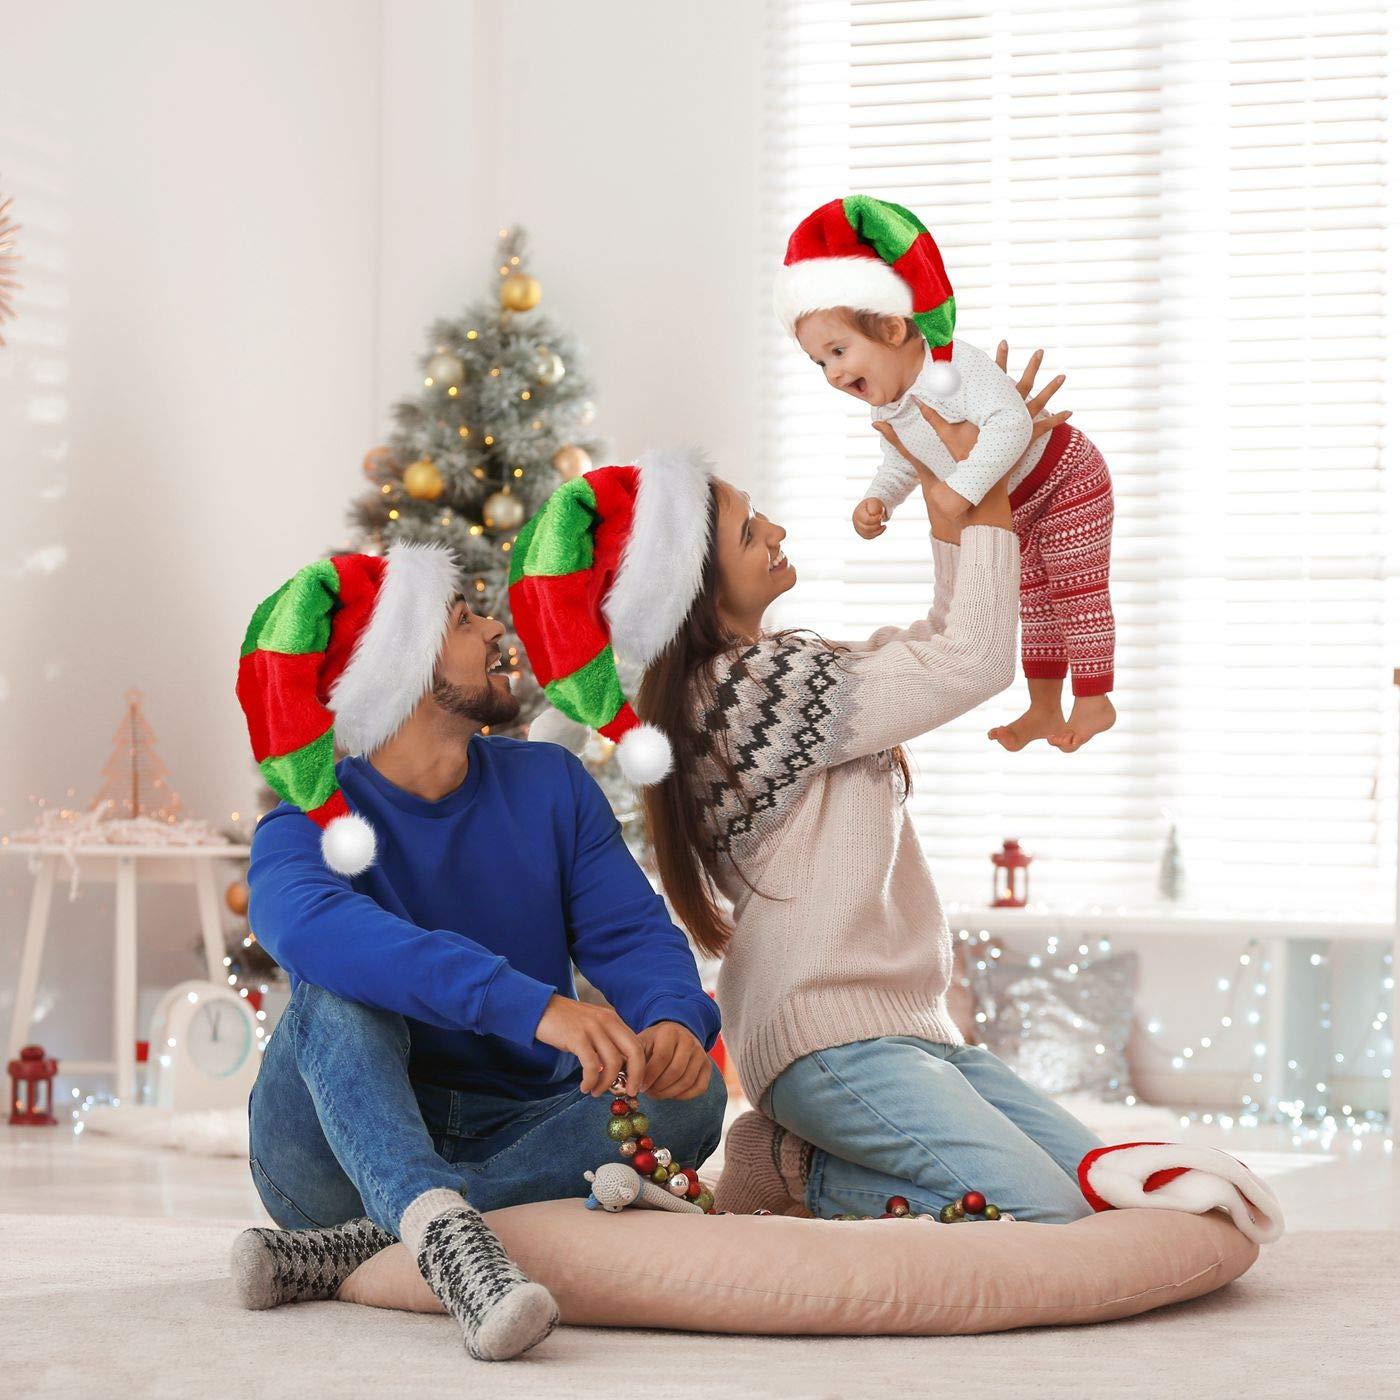 iMucci Christmas Santa Hat for Women Men Unisex-Adults Big Santa Hat Comfort Double Liner Plush Red Velvet